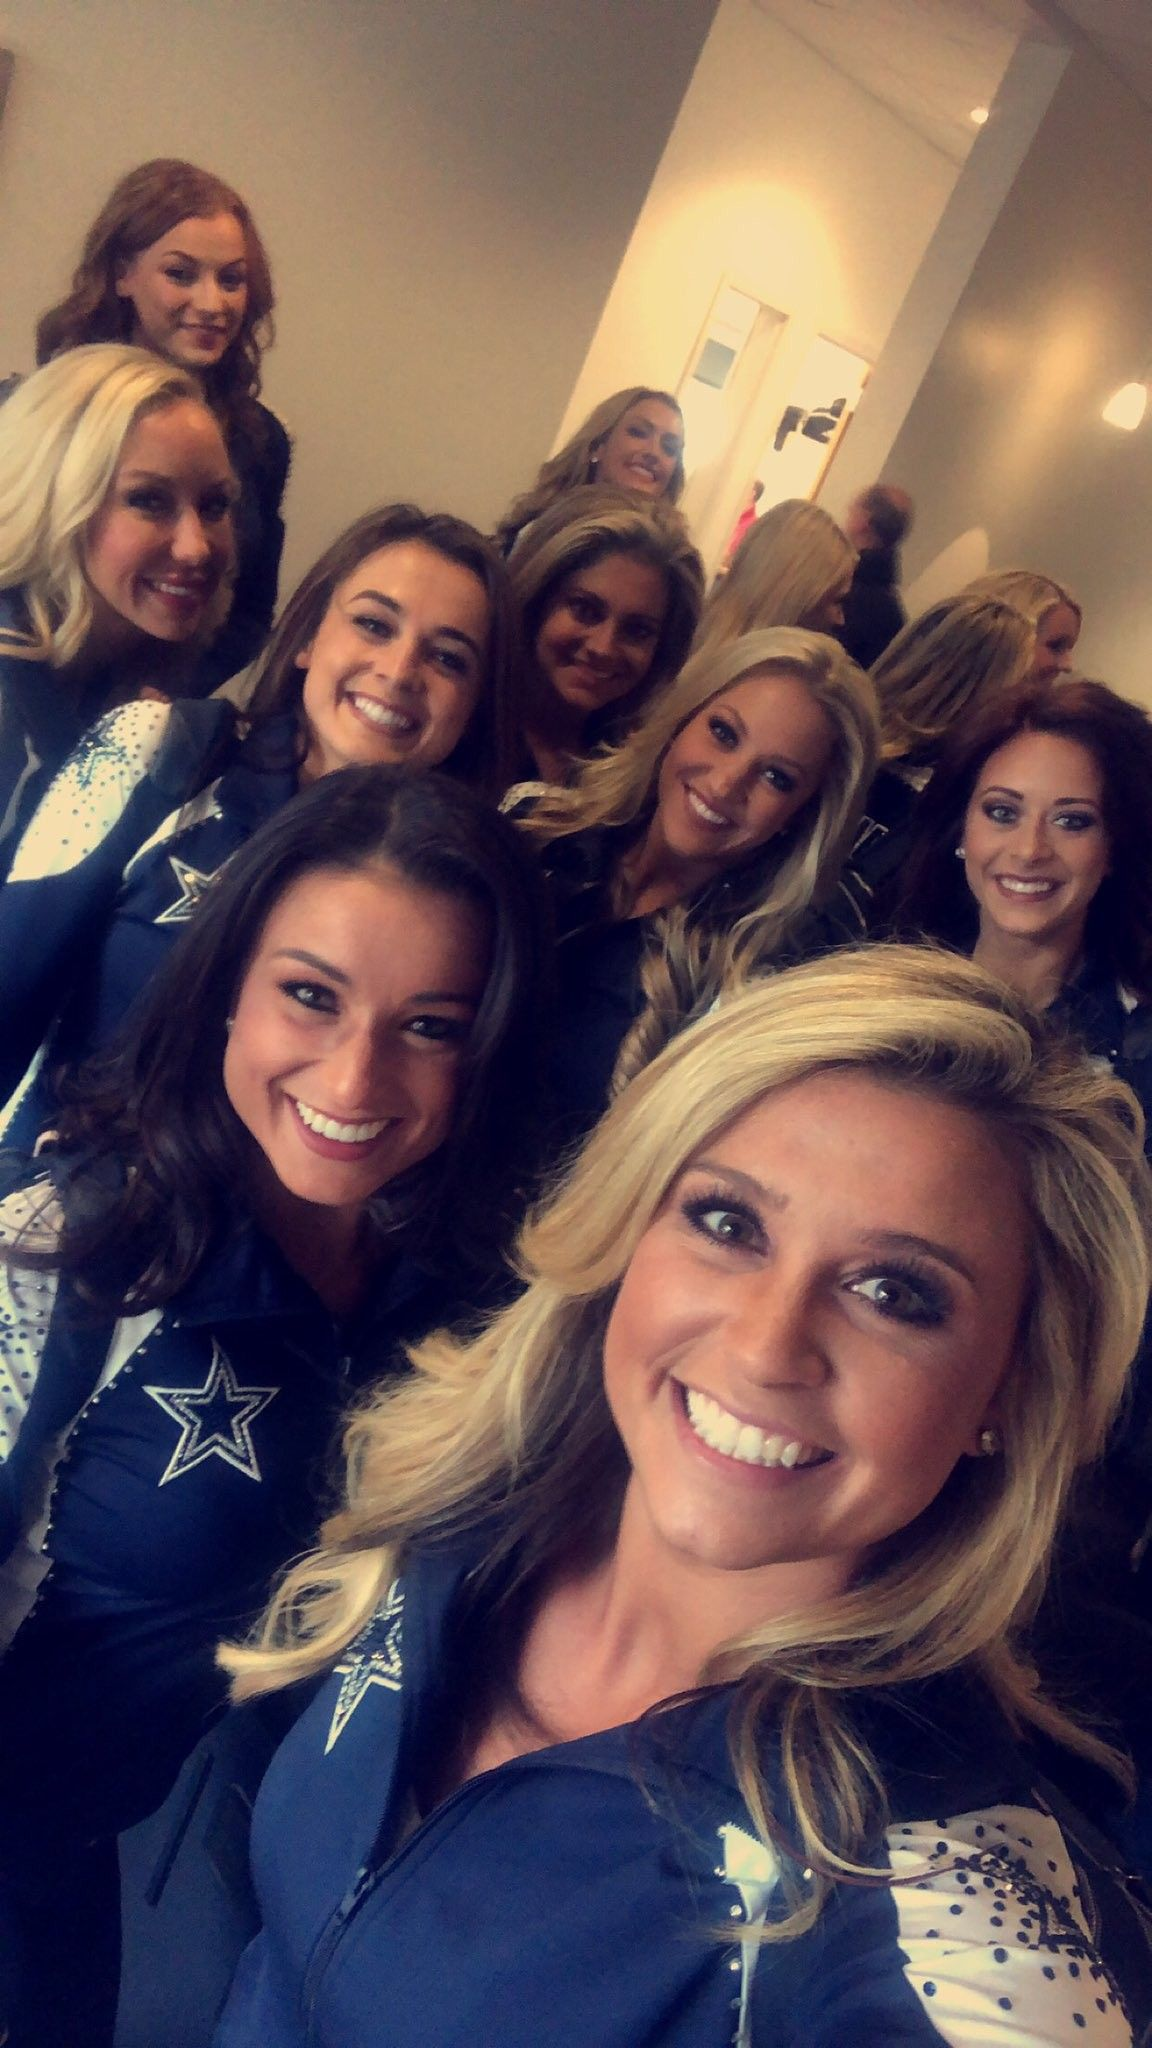 Pin on Girls wearing Pantyhose Dallas Cowboys Cheerleaders